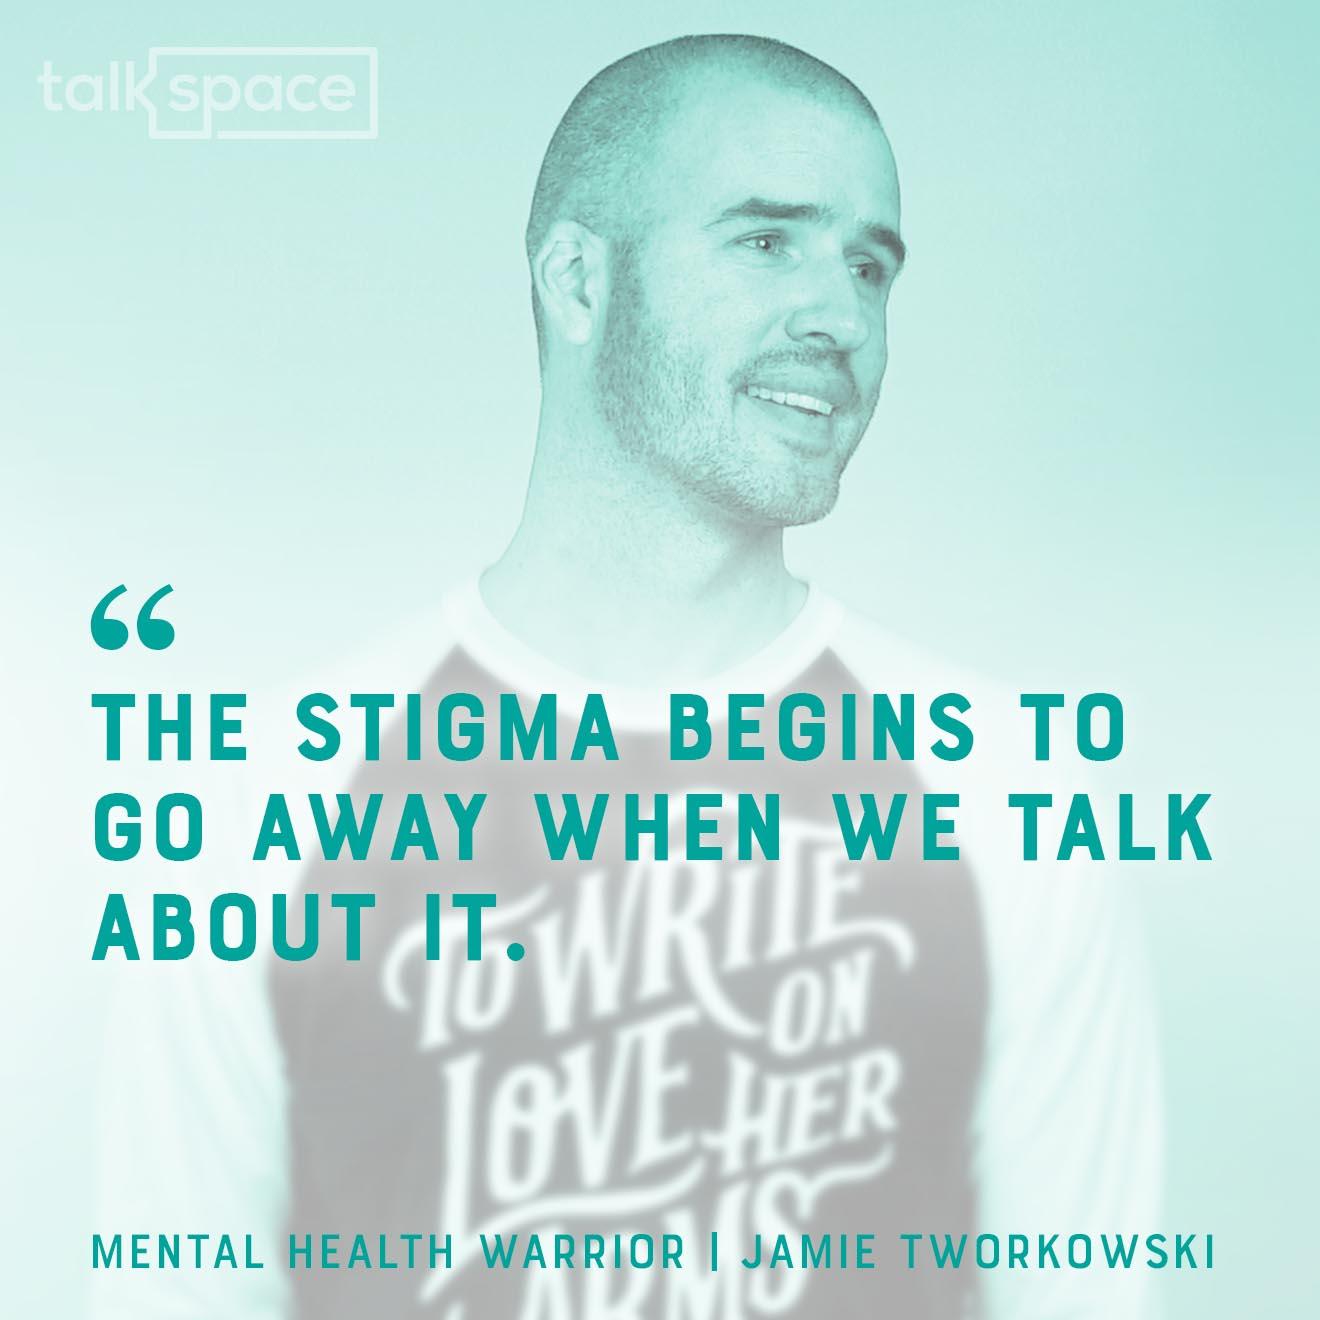 Jaimie Tworkowski TWLOHA Talkspace headshot quote